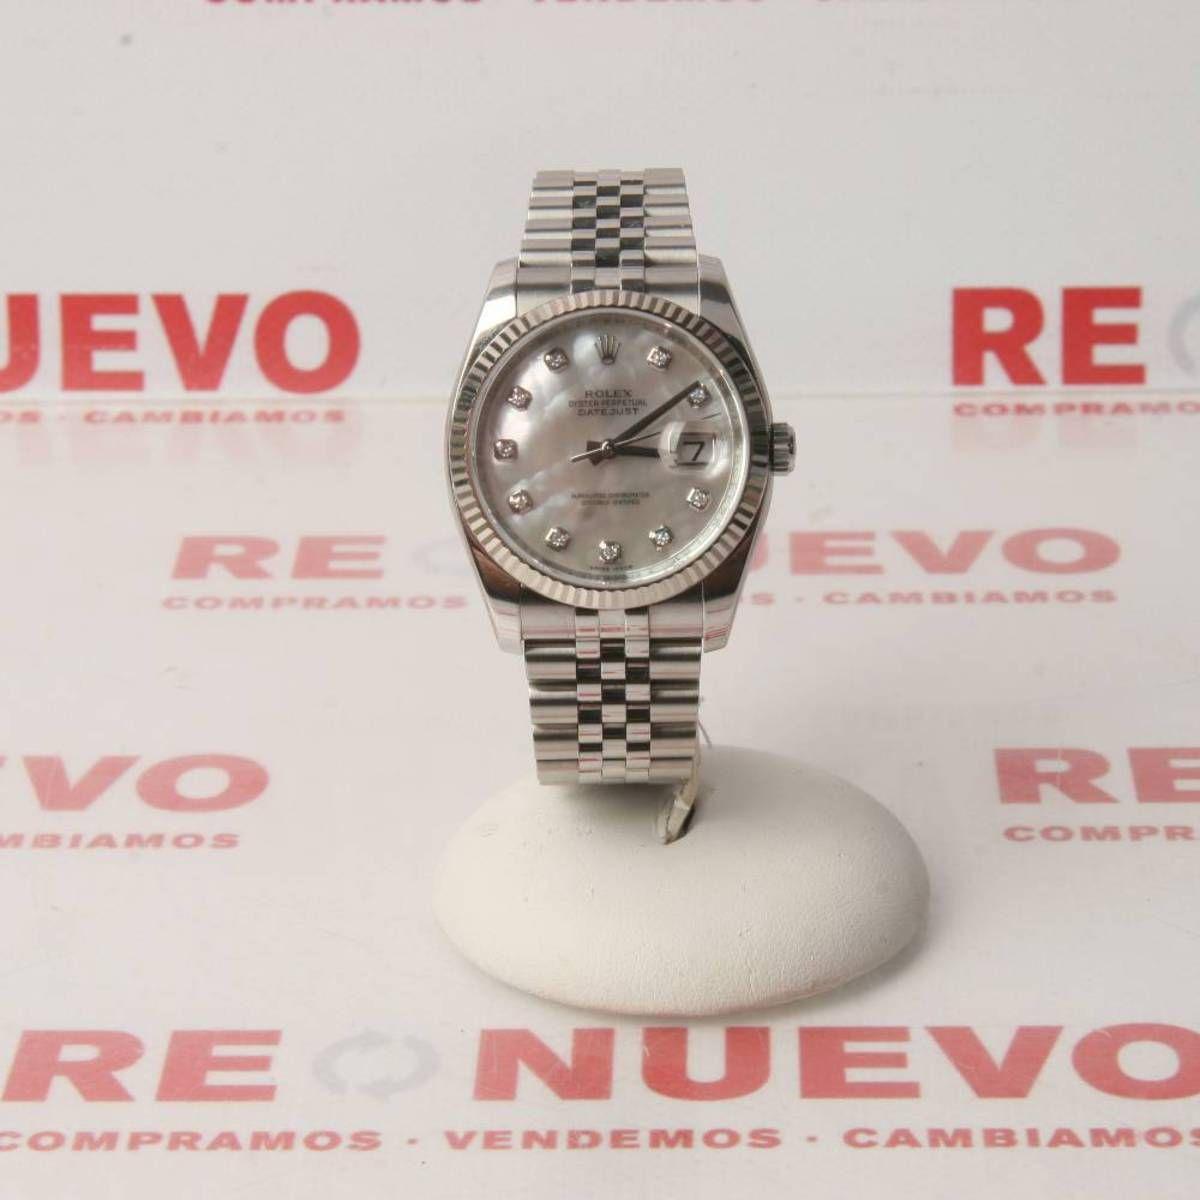 Reloj Rolex Oyster Perpetual Datejust 116234 De Segunda Mano E277144 Rolex Oyster Perpetual Rolex Relojes Rolex